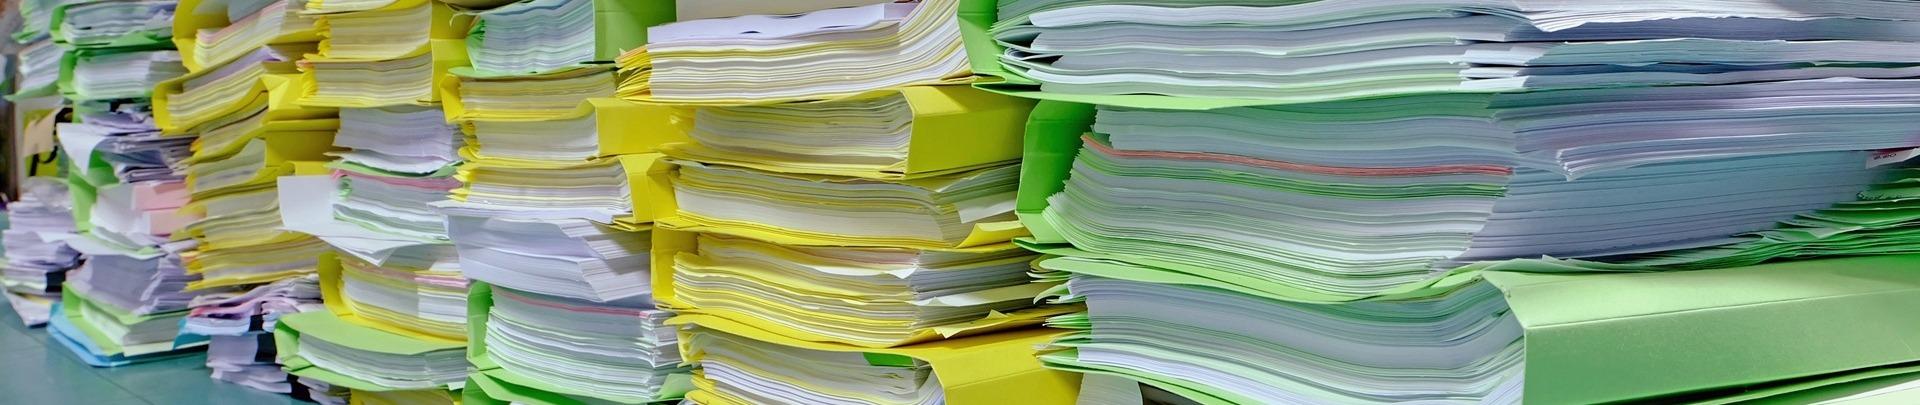 Administratie files